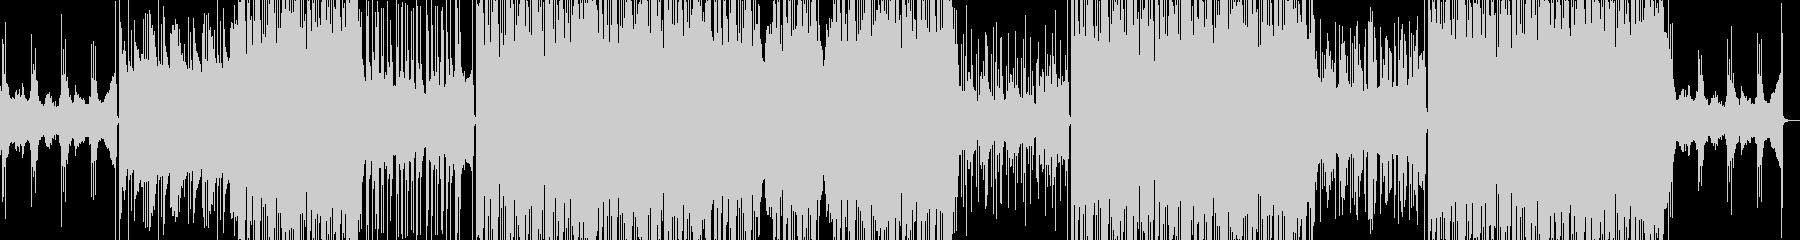 R&B・HIPHOP・オシャレ・エモいの未再生の波形